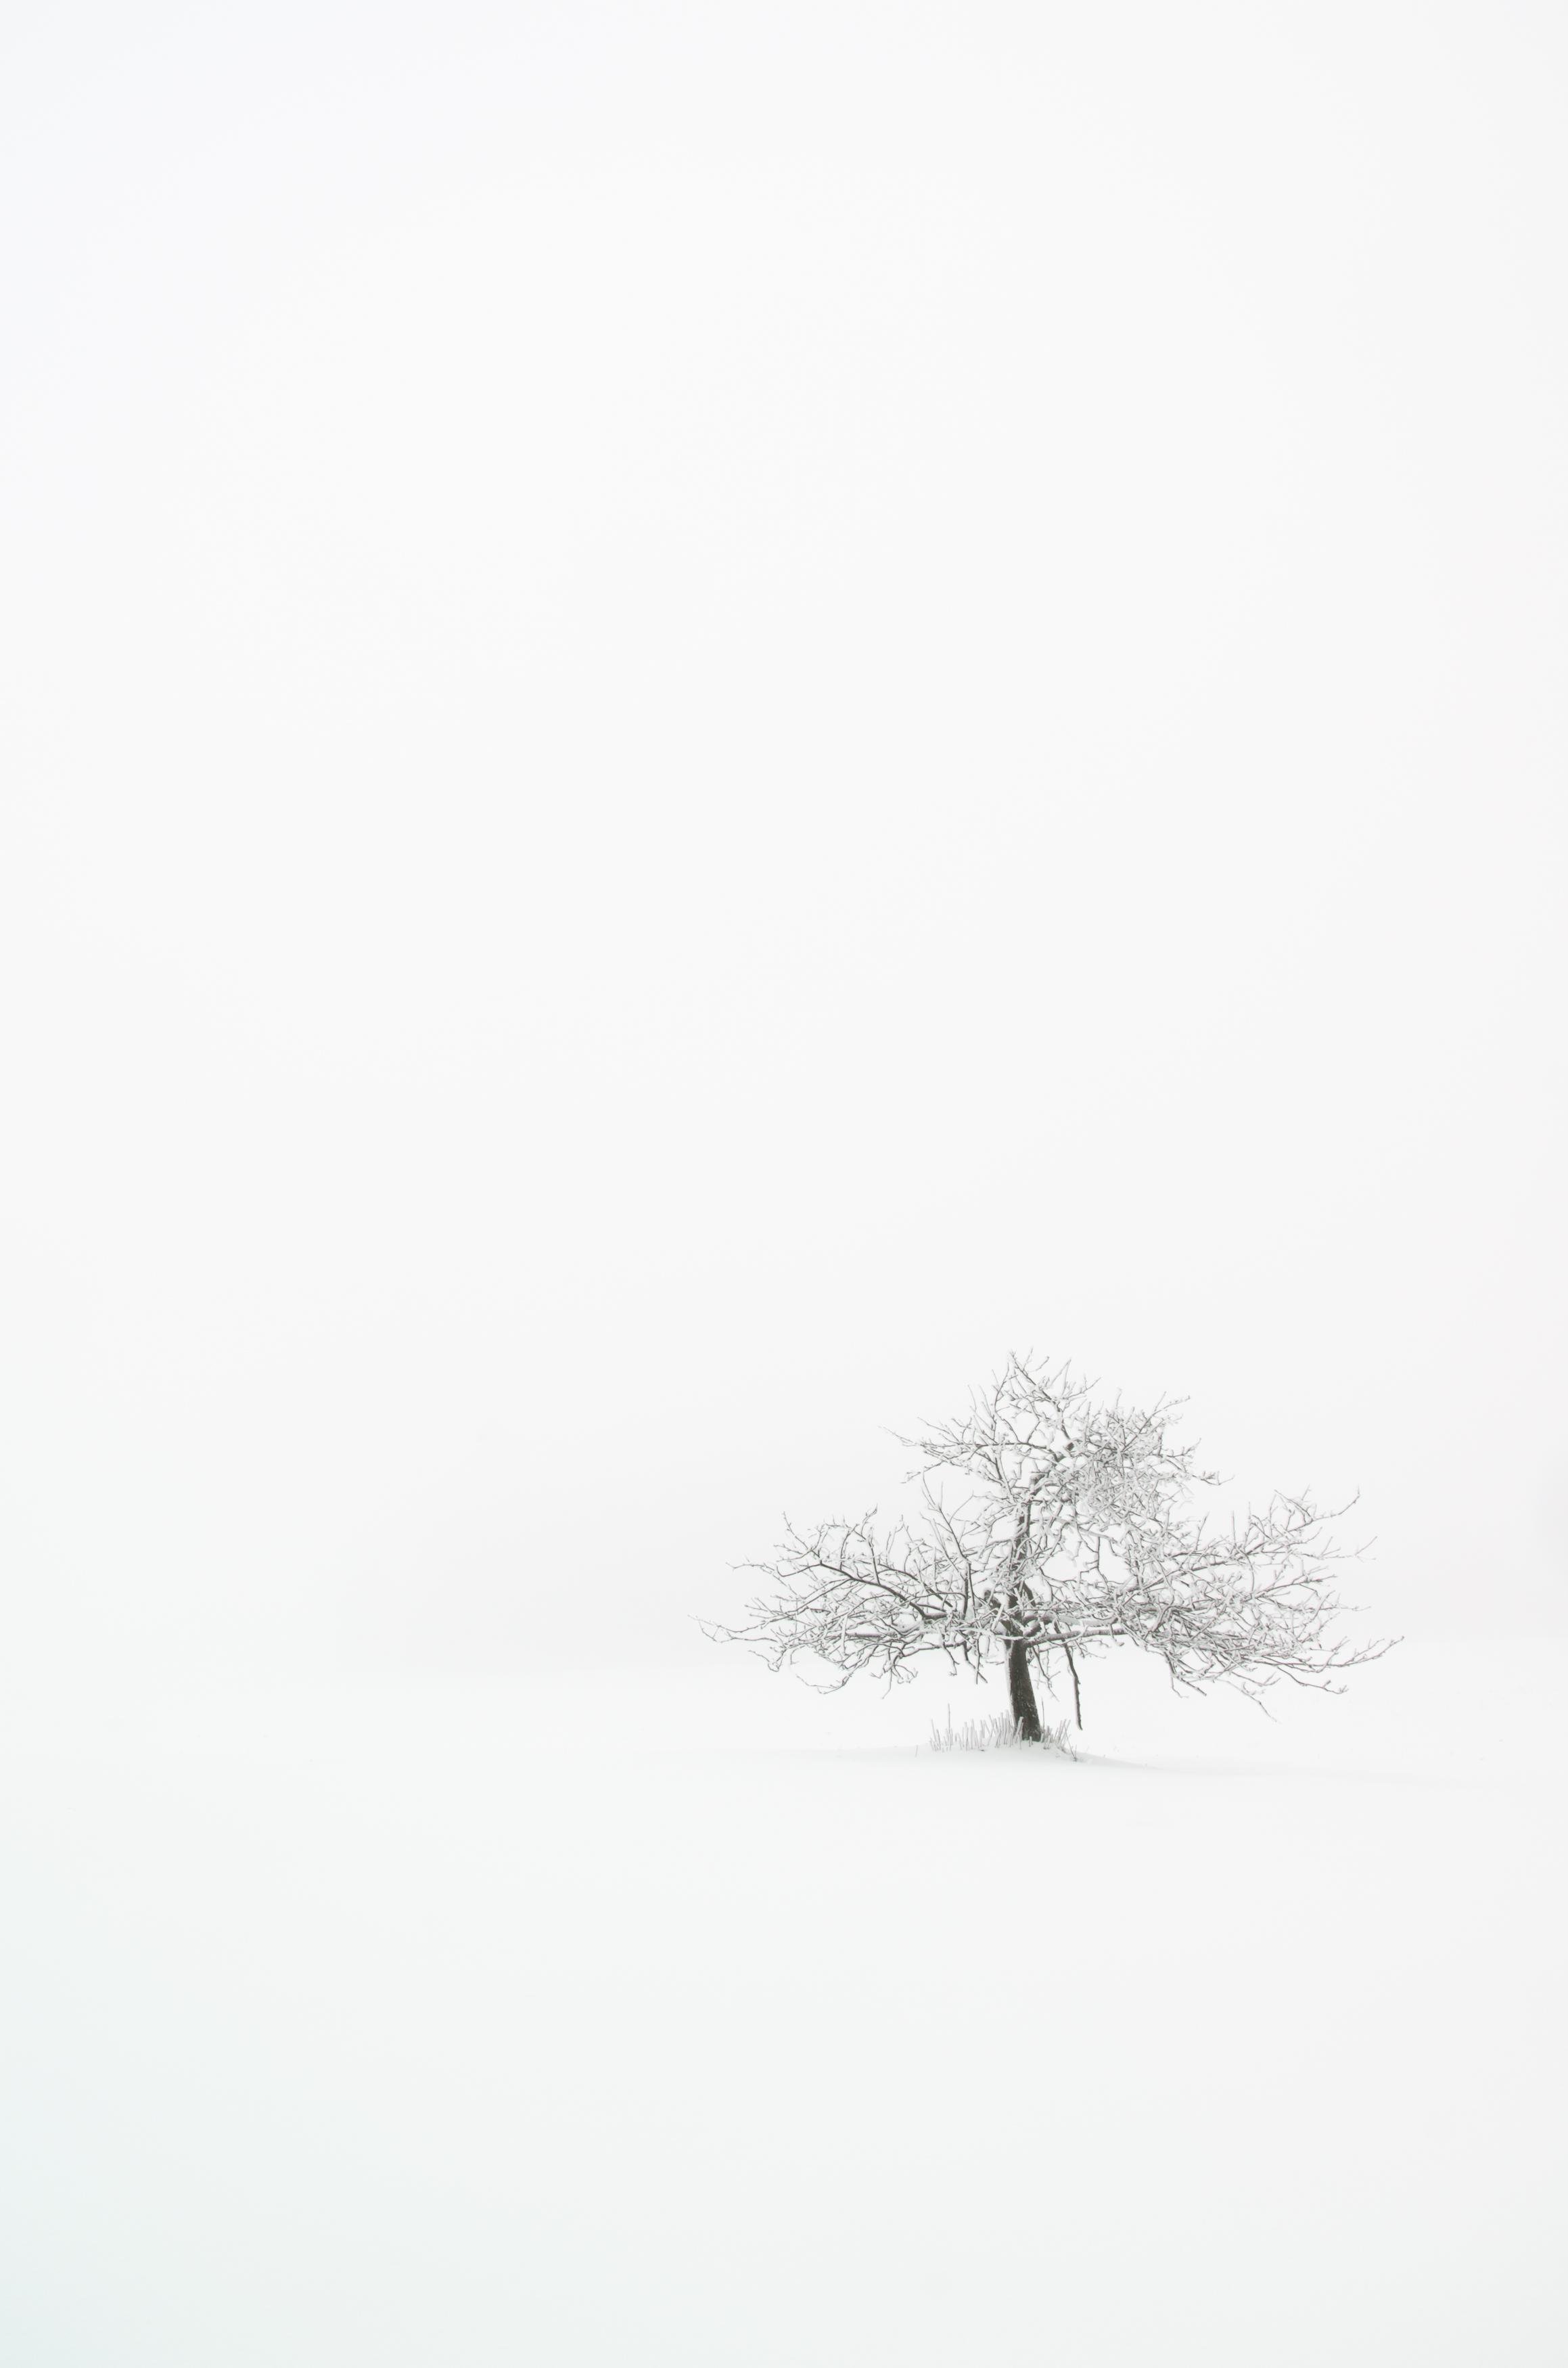 JensFiedler Photography